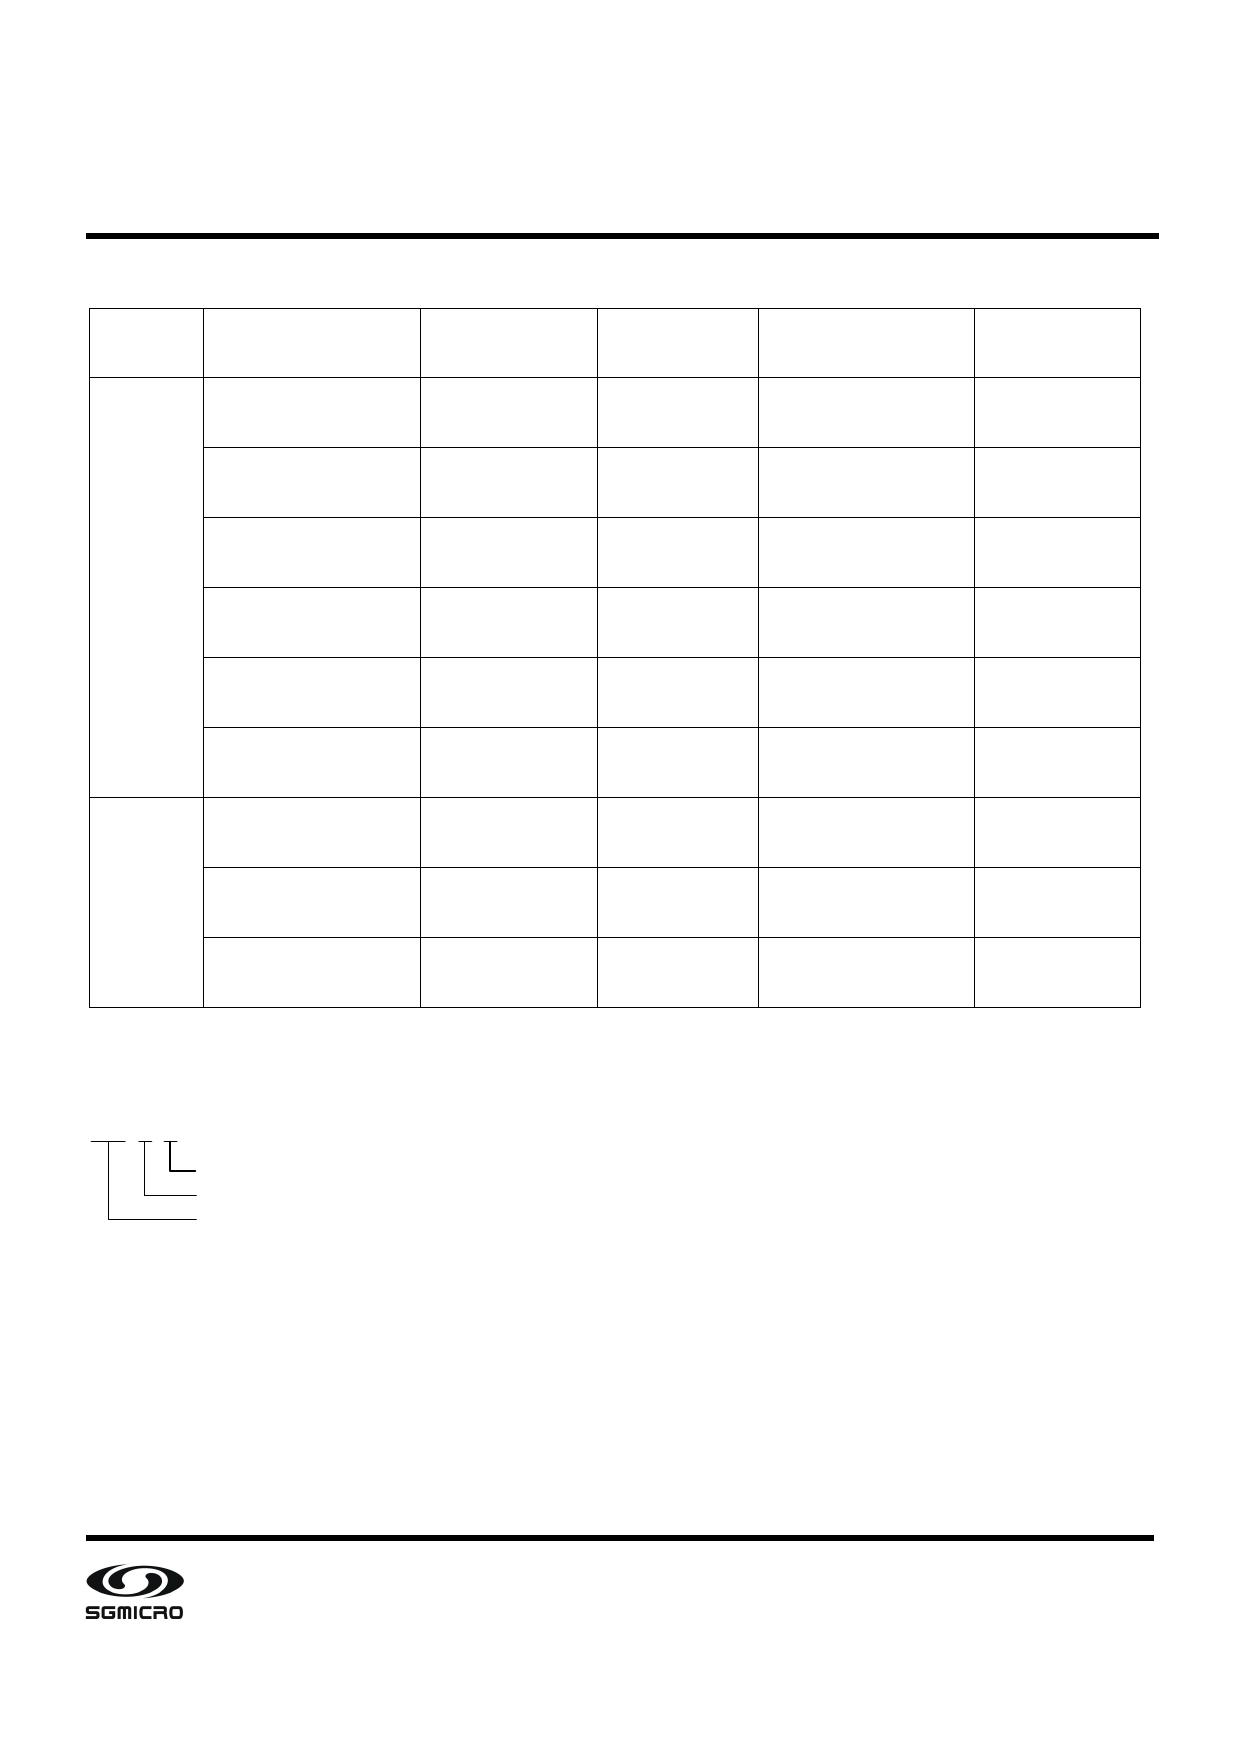 SGM8927 pdf, schematic